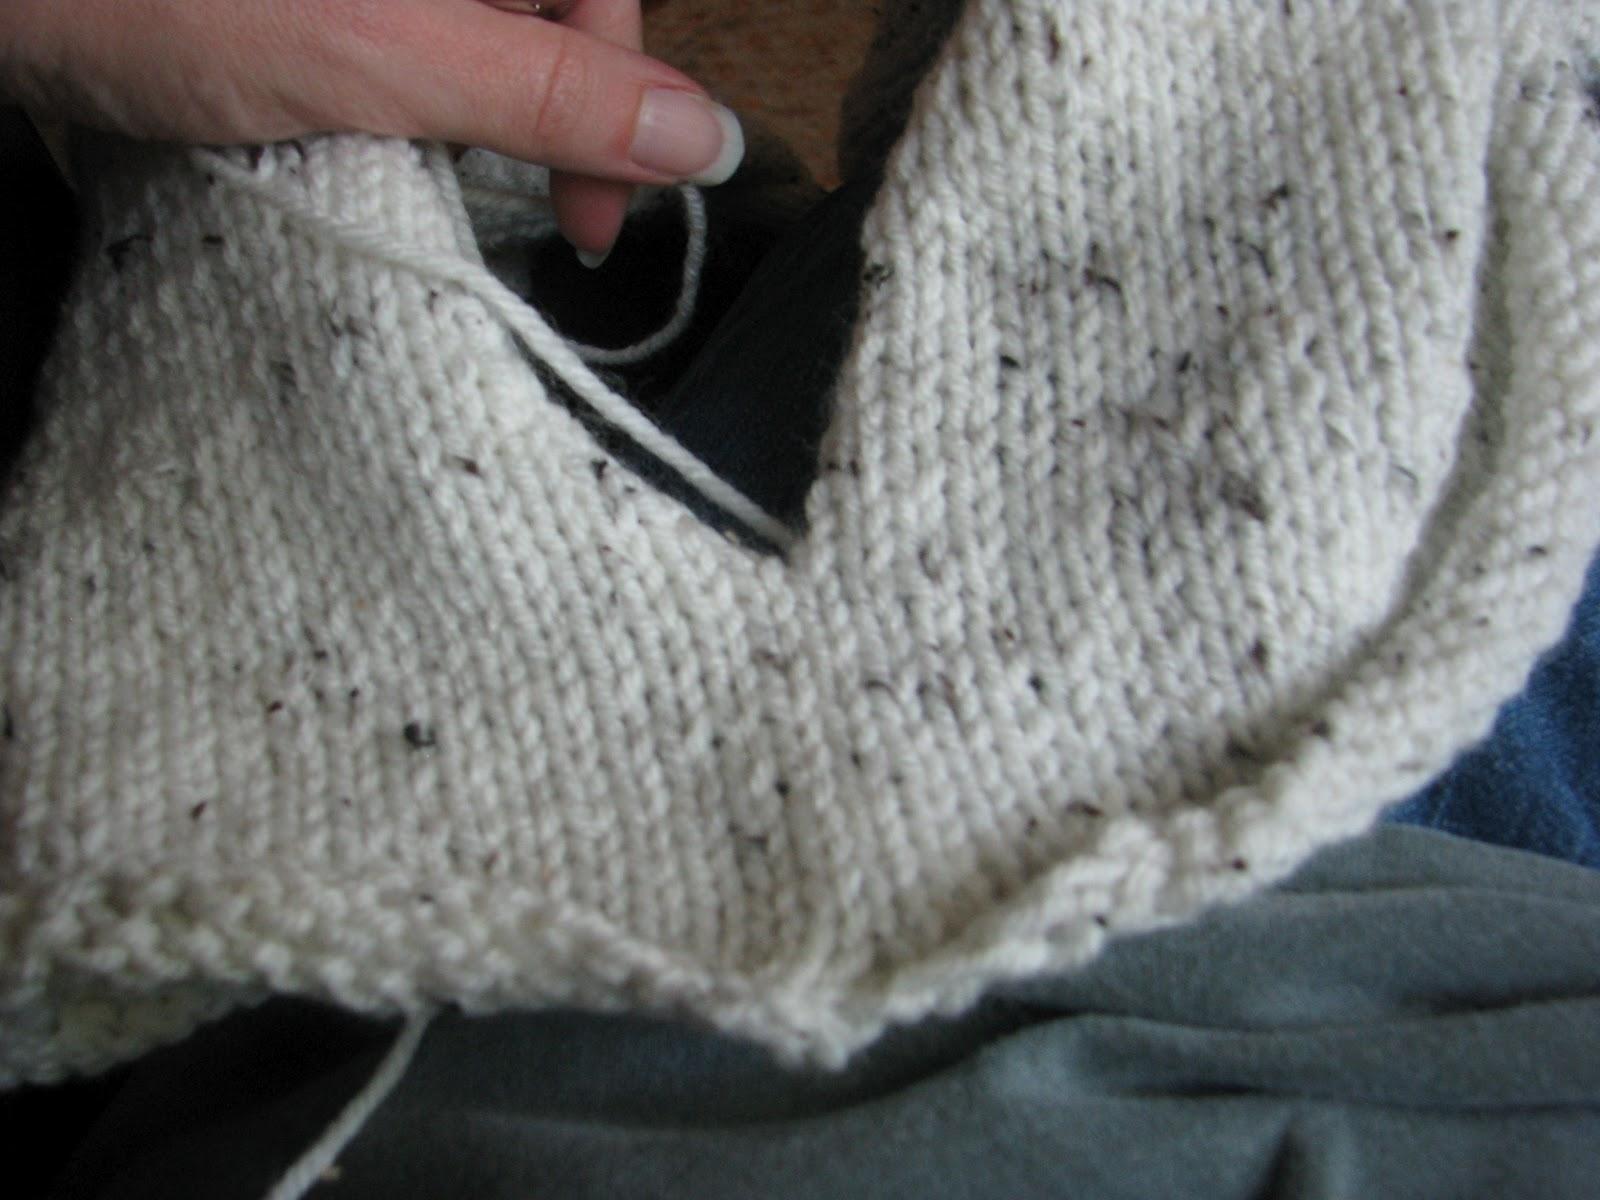 Knitting Stitches Joining Seams : Three Strands Together: Seaming the Mary Maxim Aran Tweed Kimono